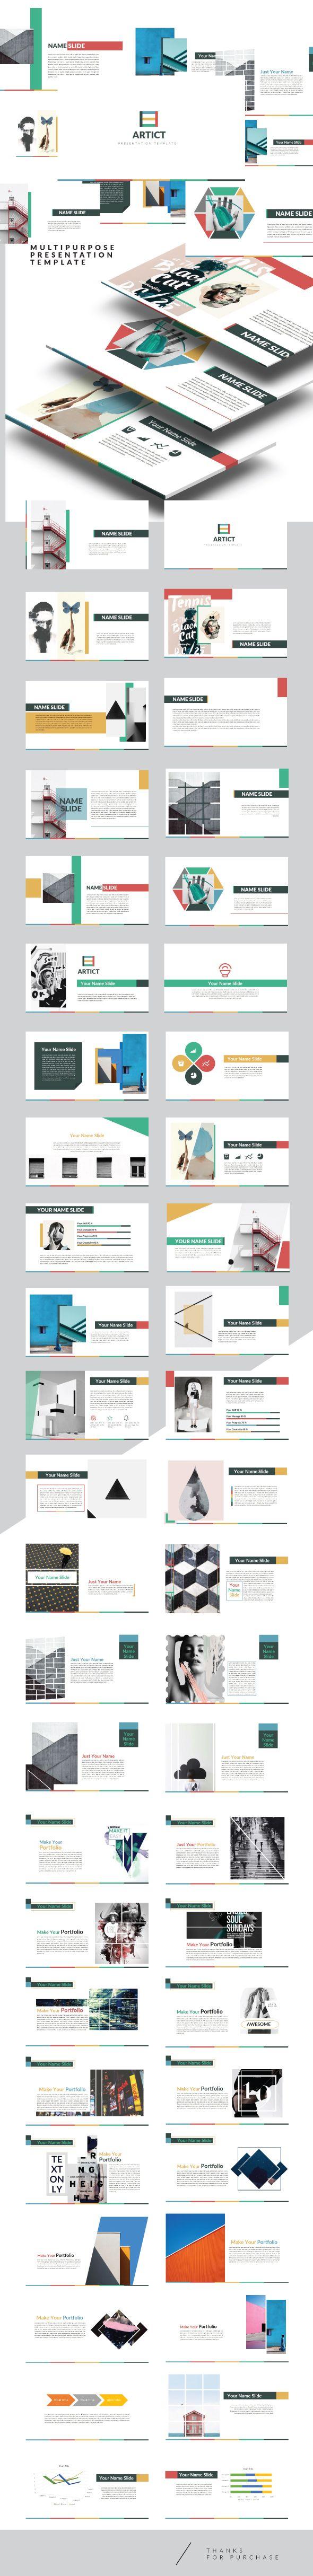 Artic - Multipurpose Keynote Creative Template